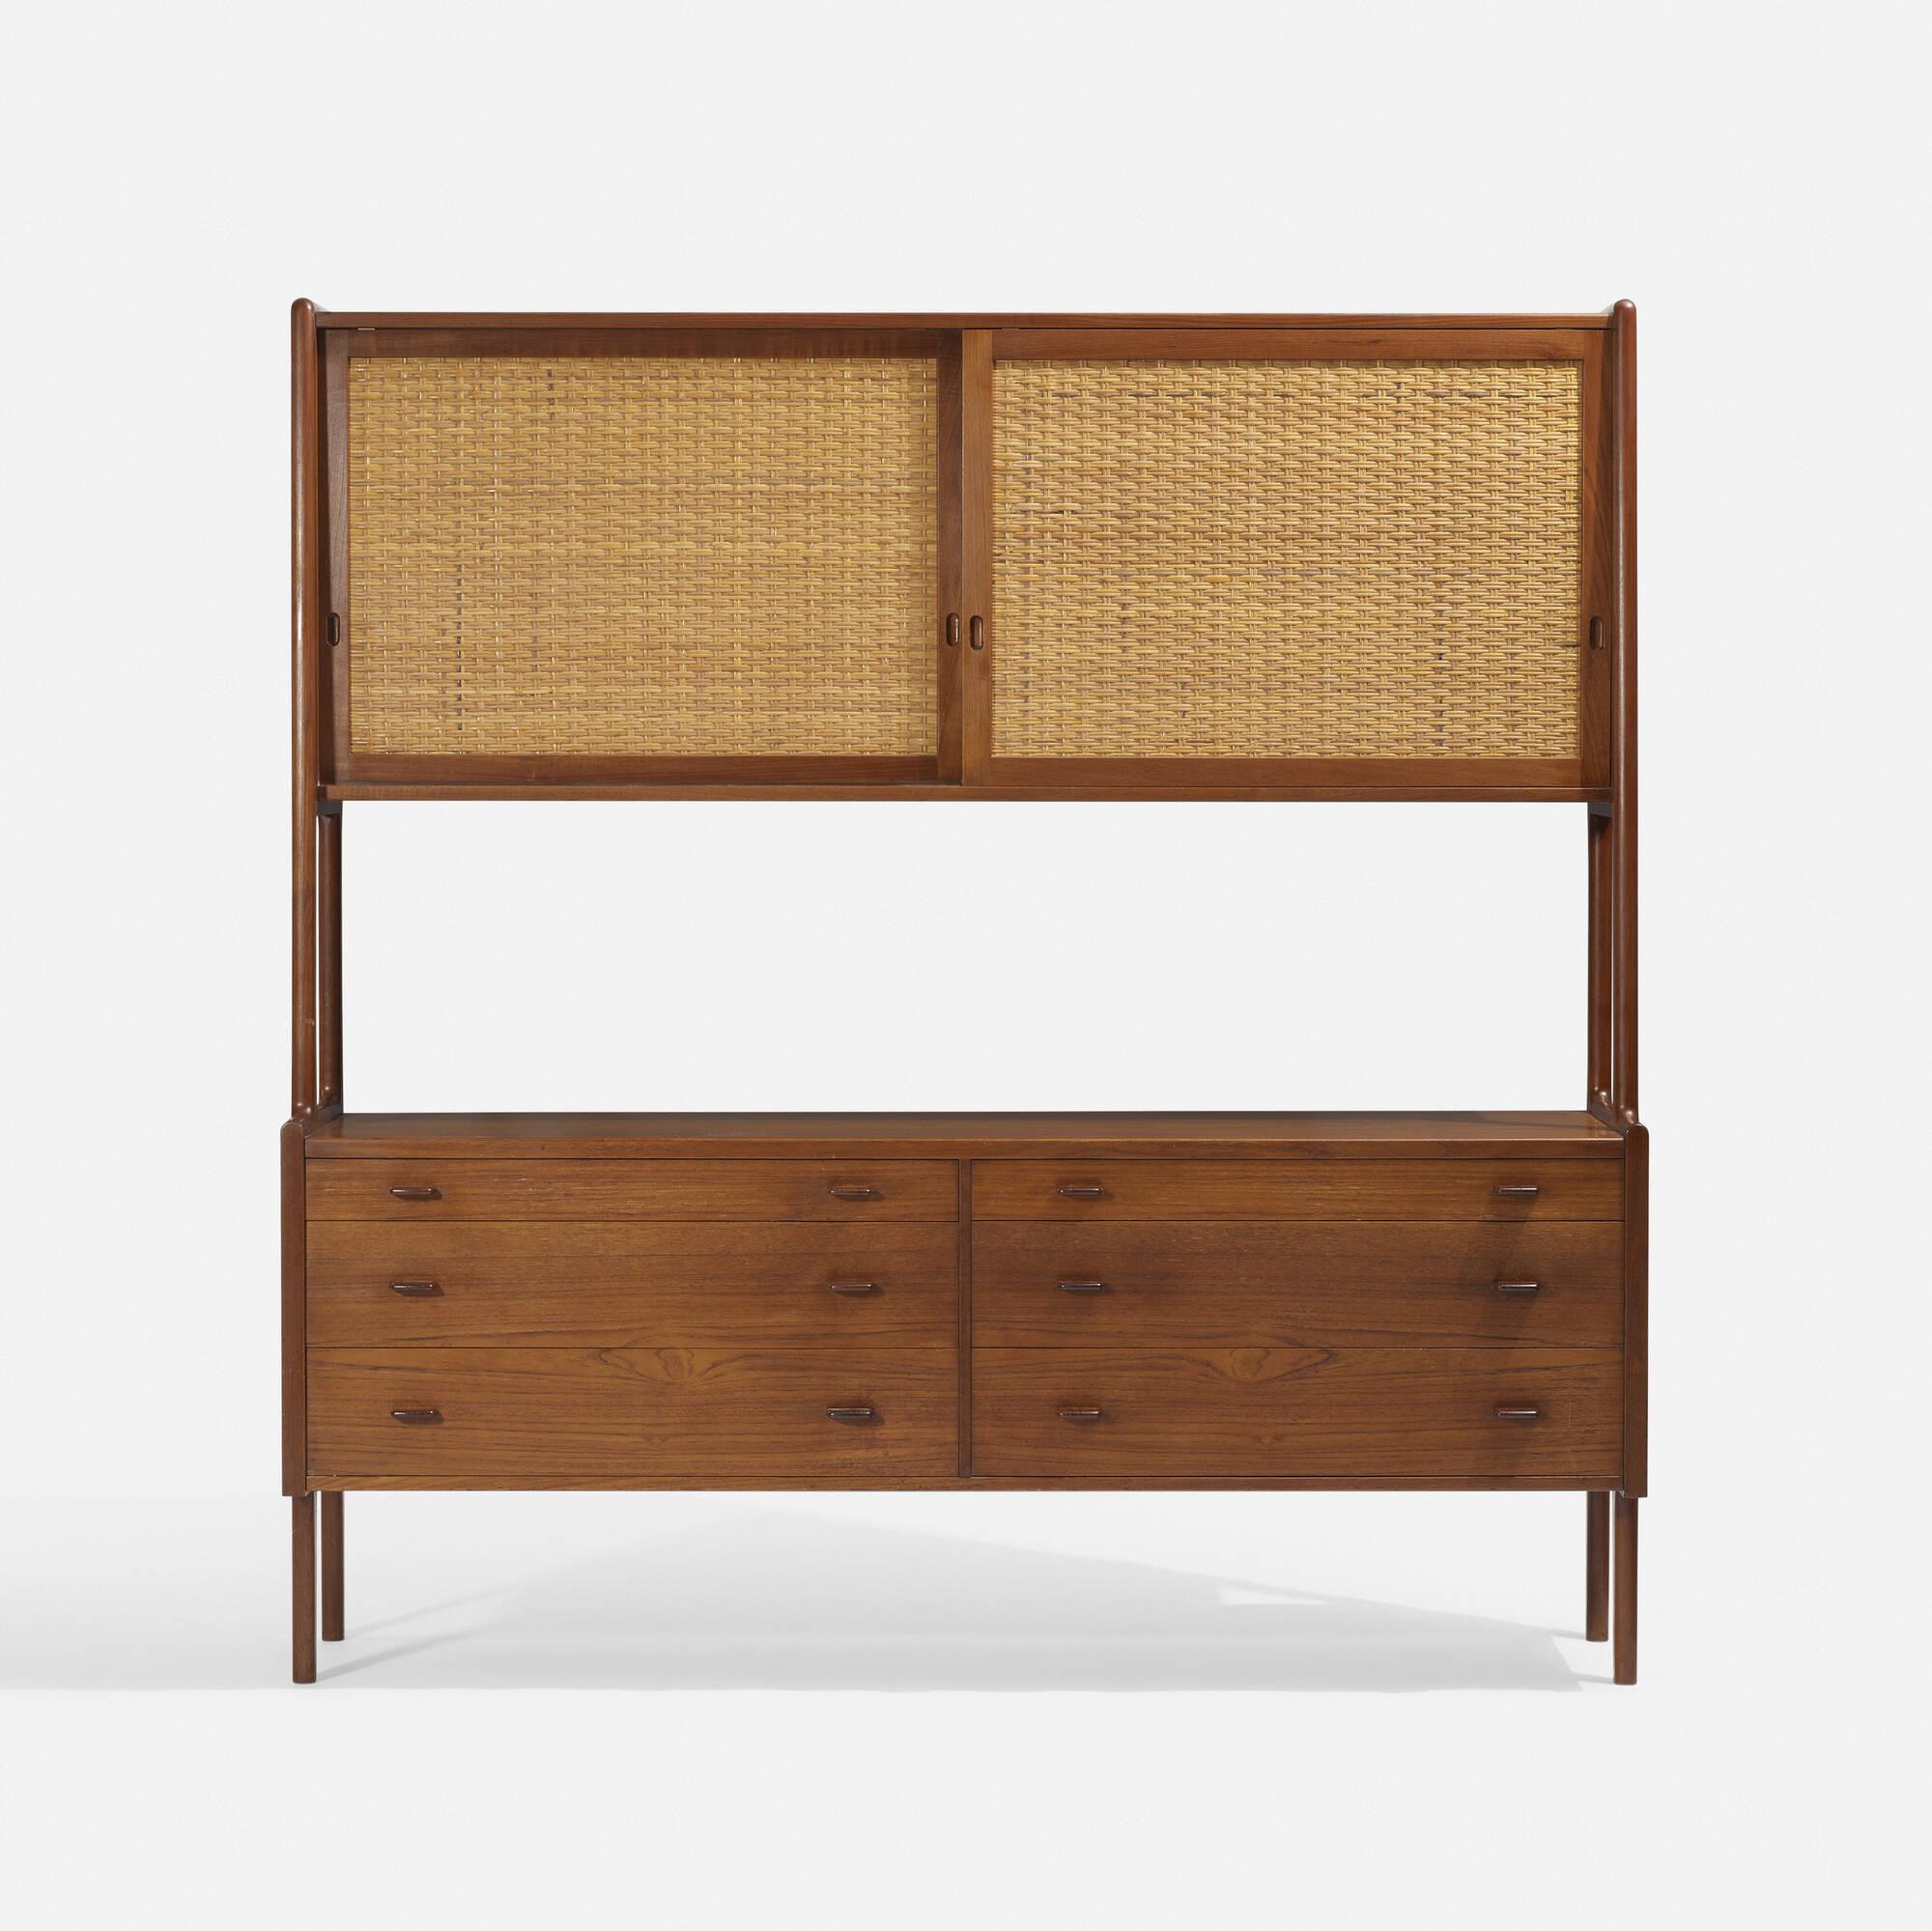 788: Hans J. Wegner / cabinet, model RY20 (1 of 3)